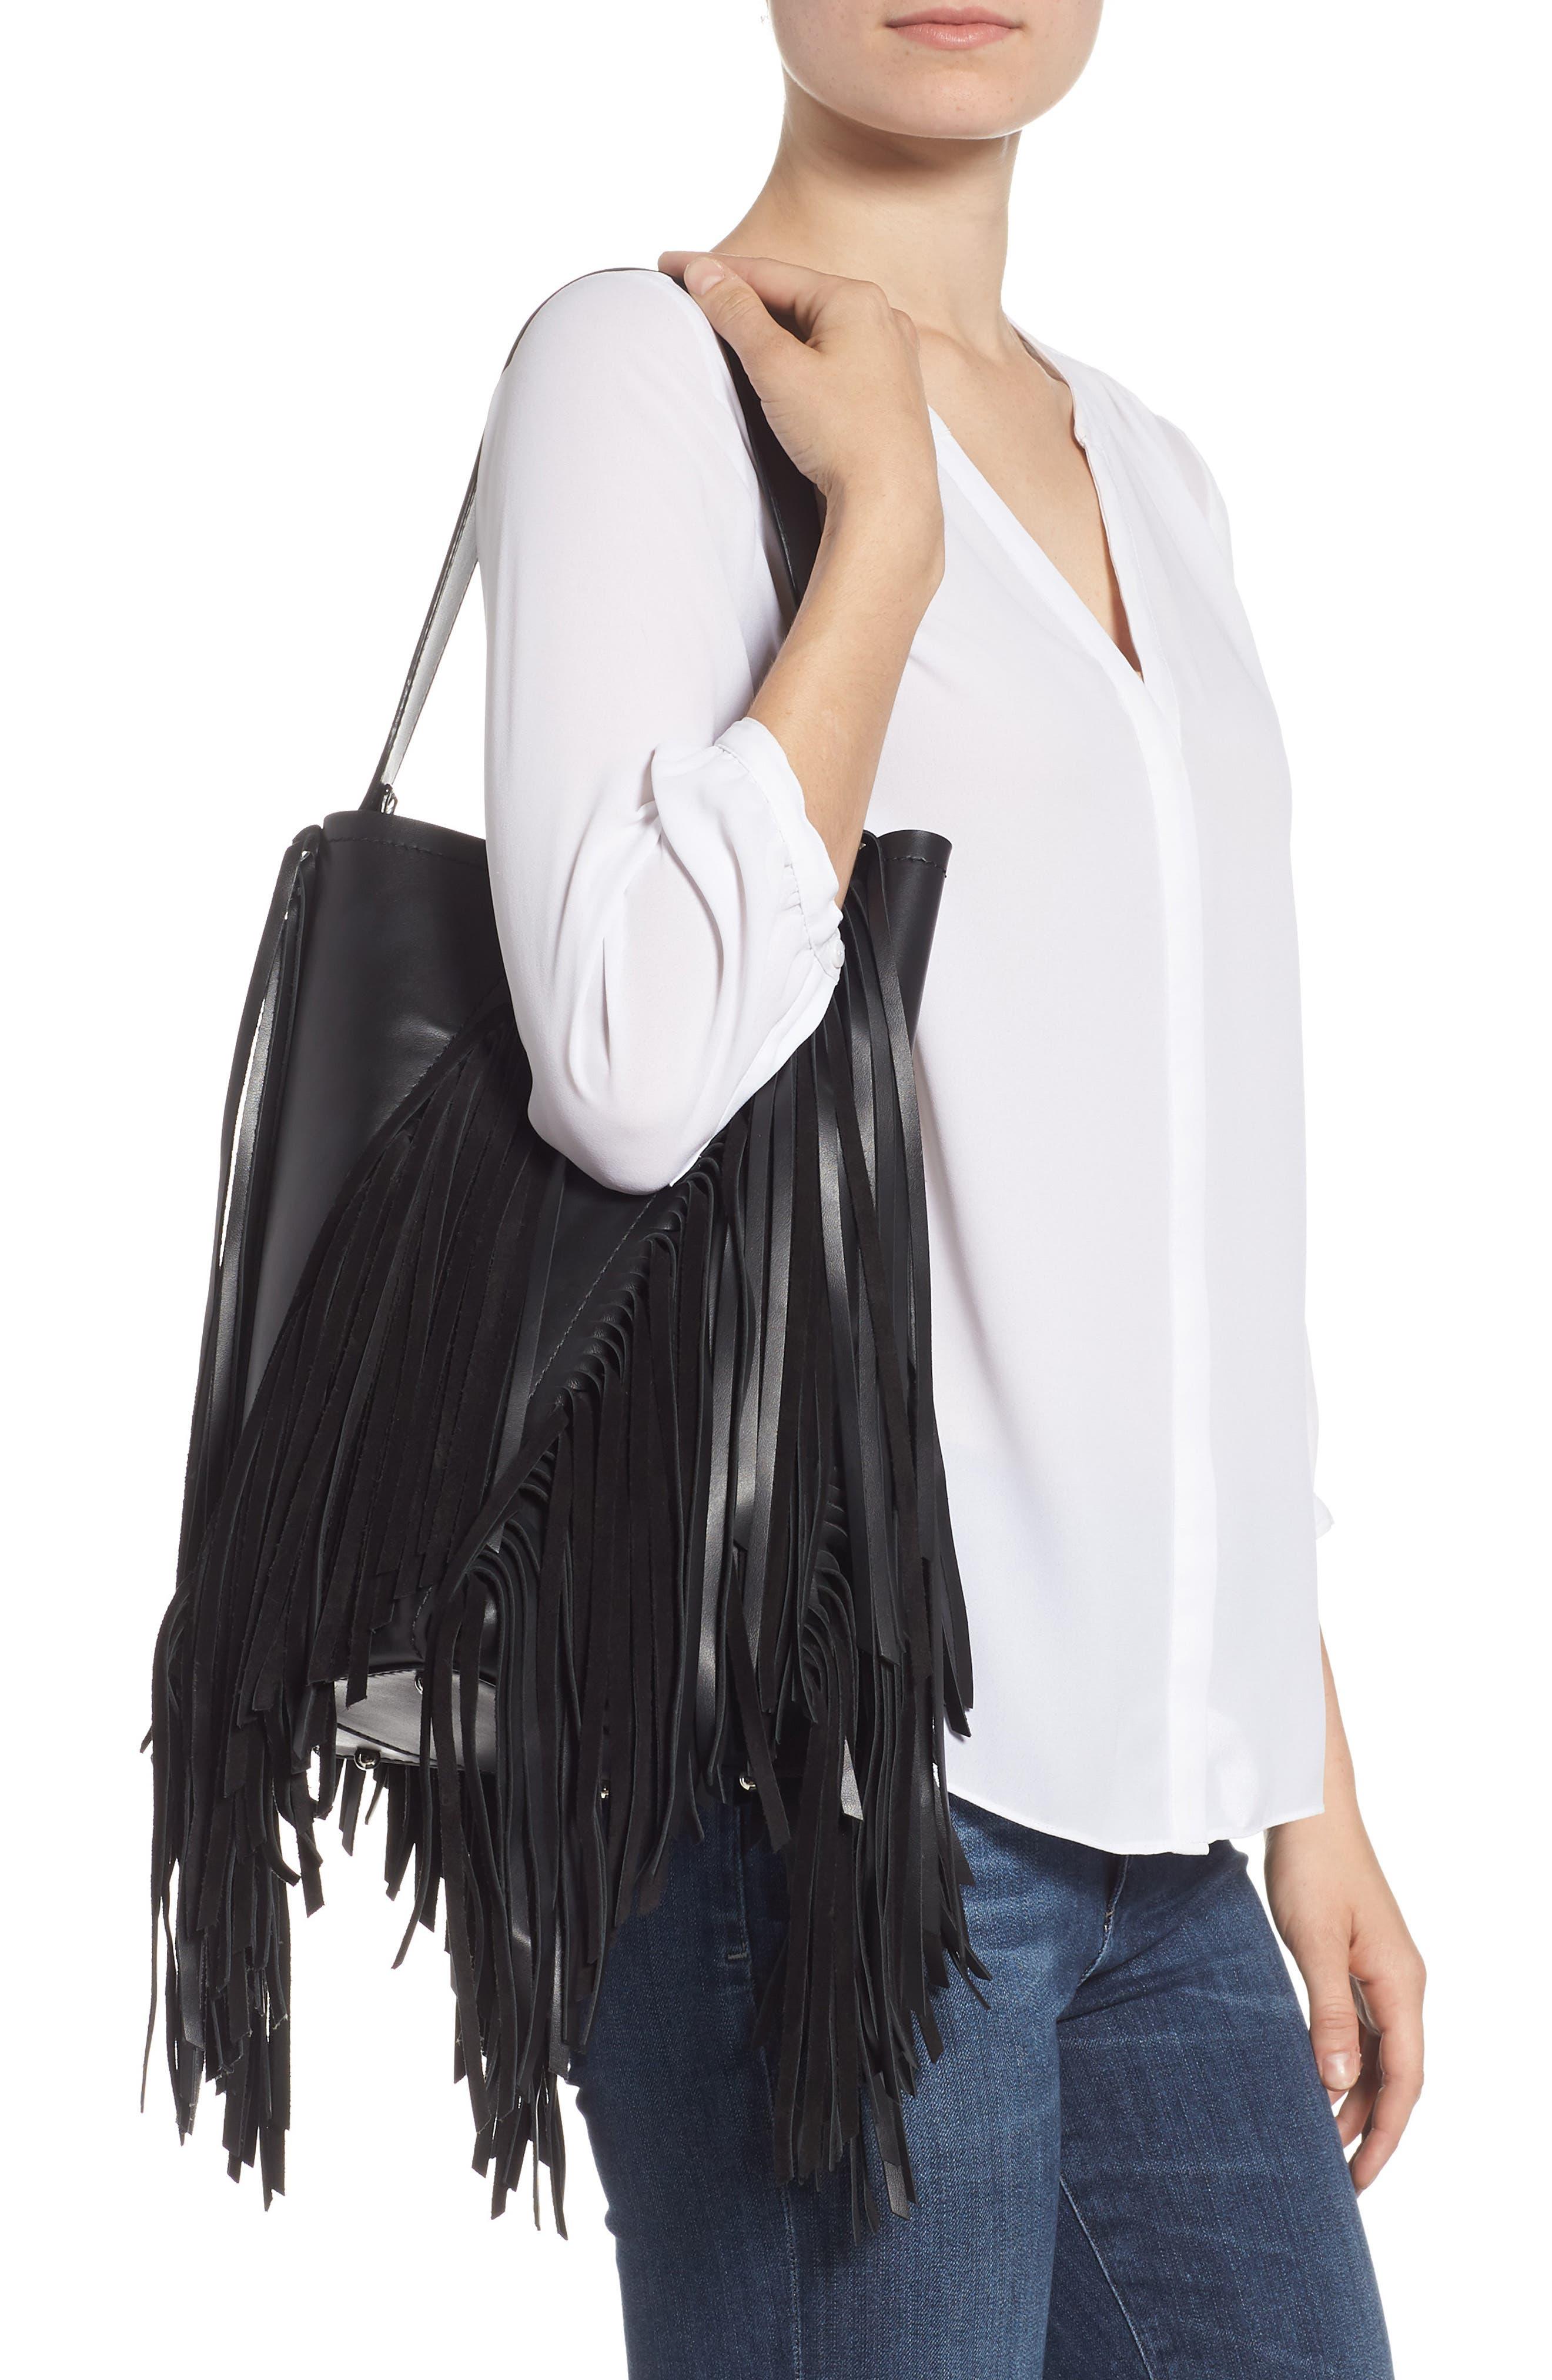 PROENZA SCHOULER, Medium Hex Fringe Calfskin Leather Bucket Bag, Alternate thumbnail 2, color, BLACK/ BLACK